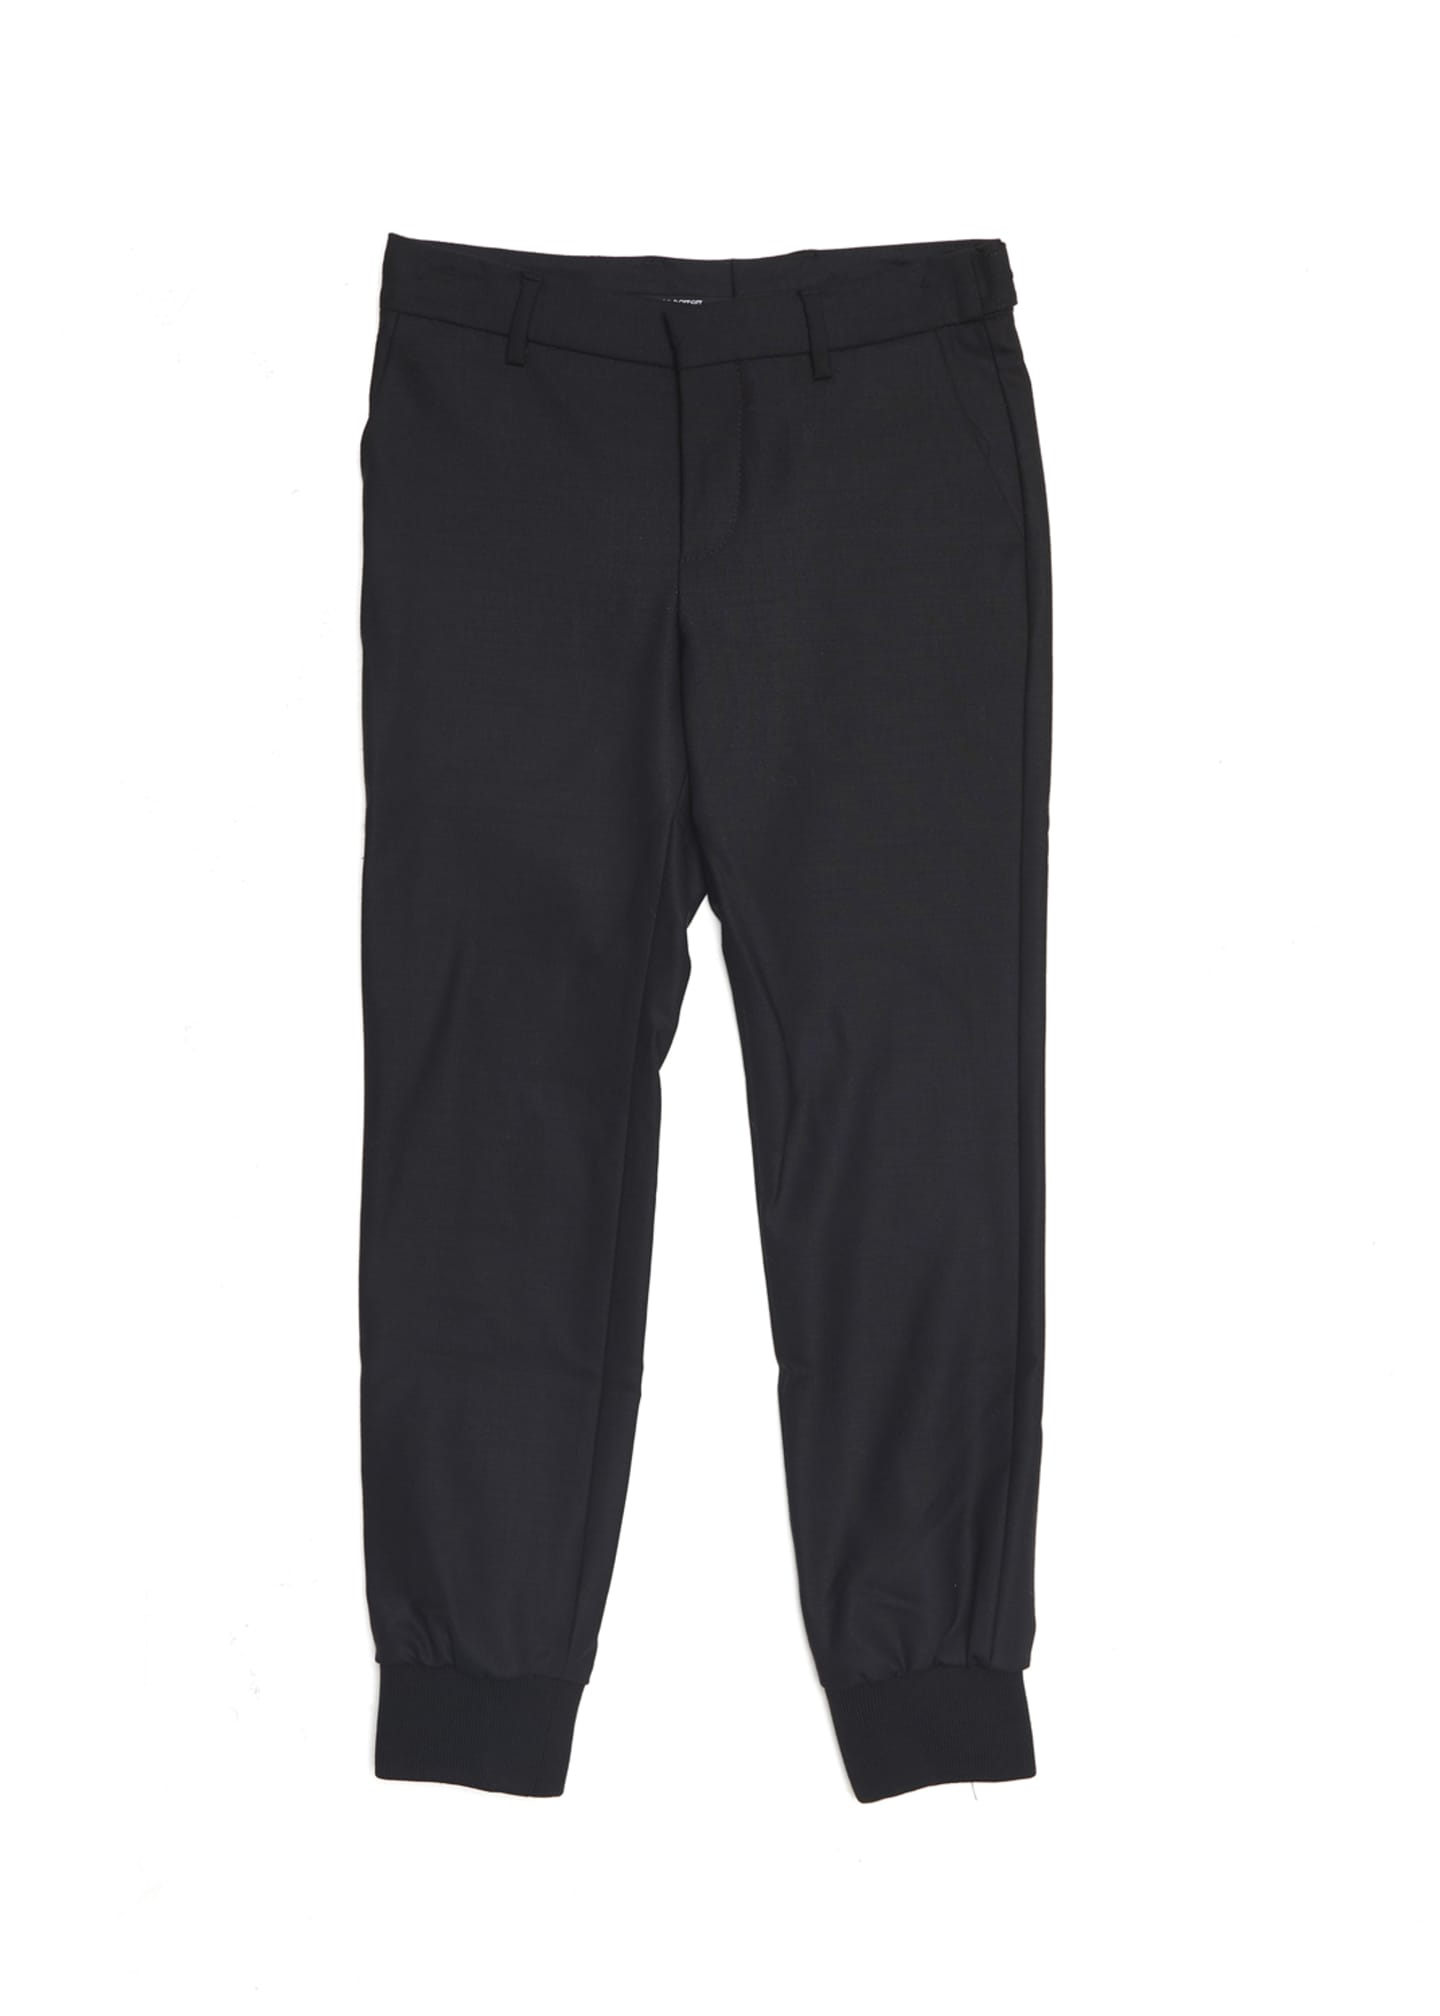 Neil Barrett Bi-Stretch Gabardine Pants, Size 4